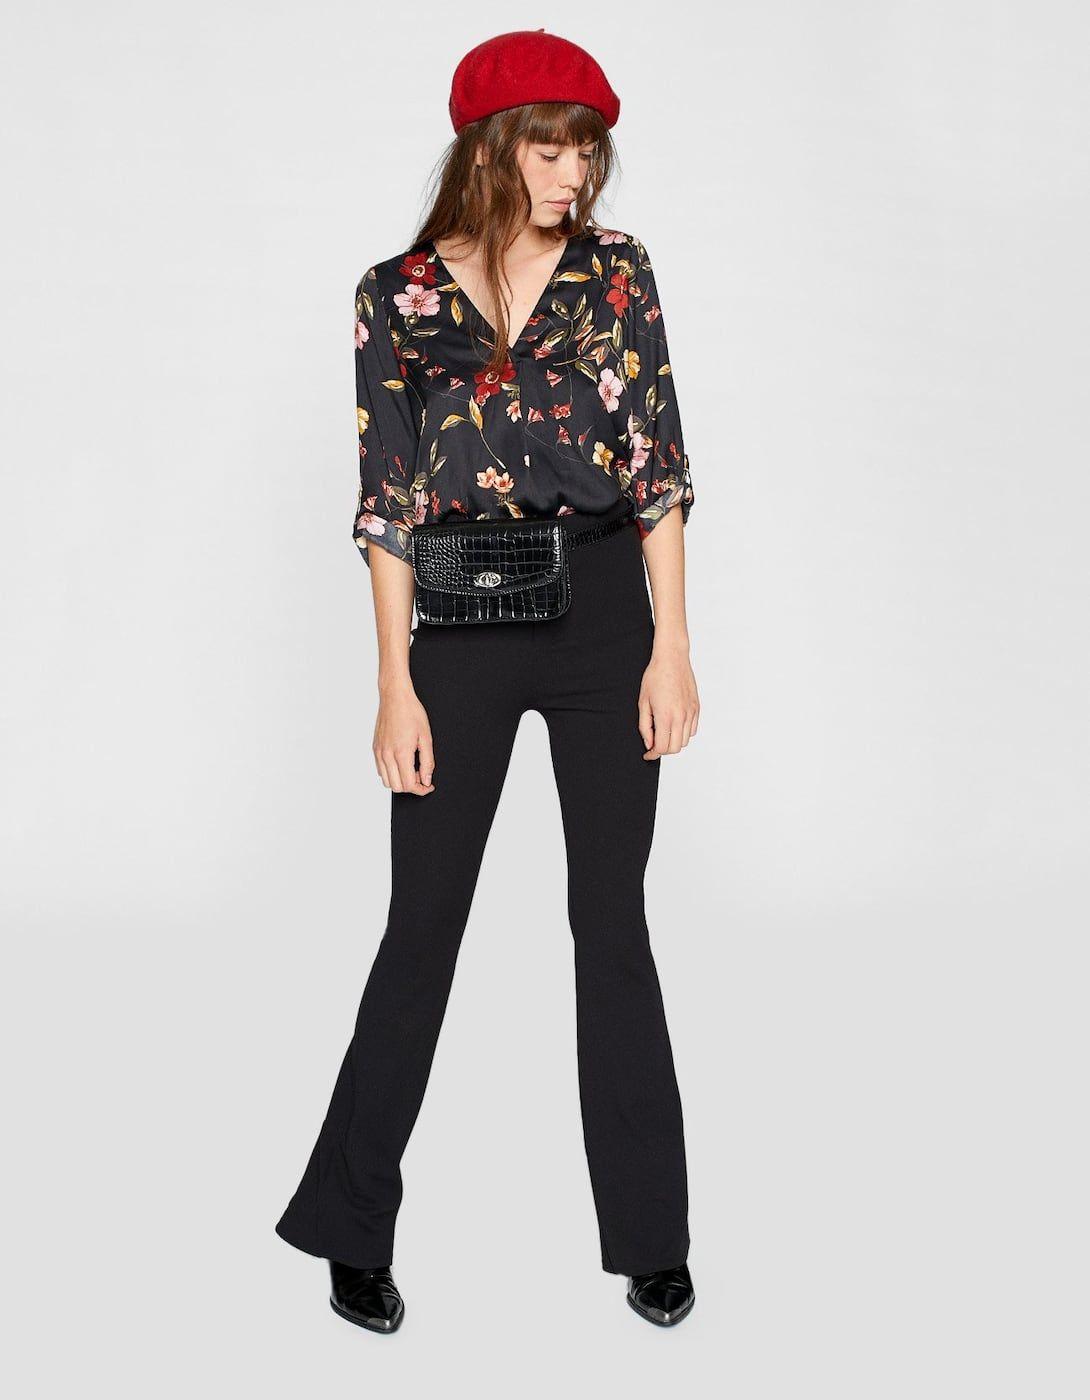 Floral V Neck Shirt Shirts Blouses Stradivarius Romania Fashion Casual Fashion Summer Fashion